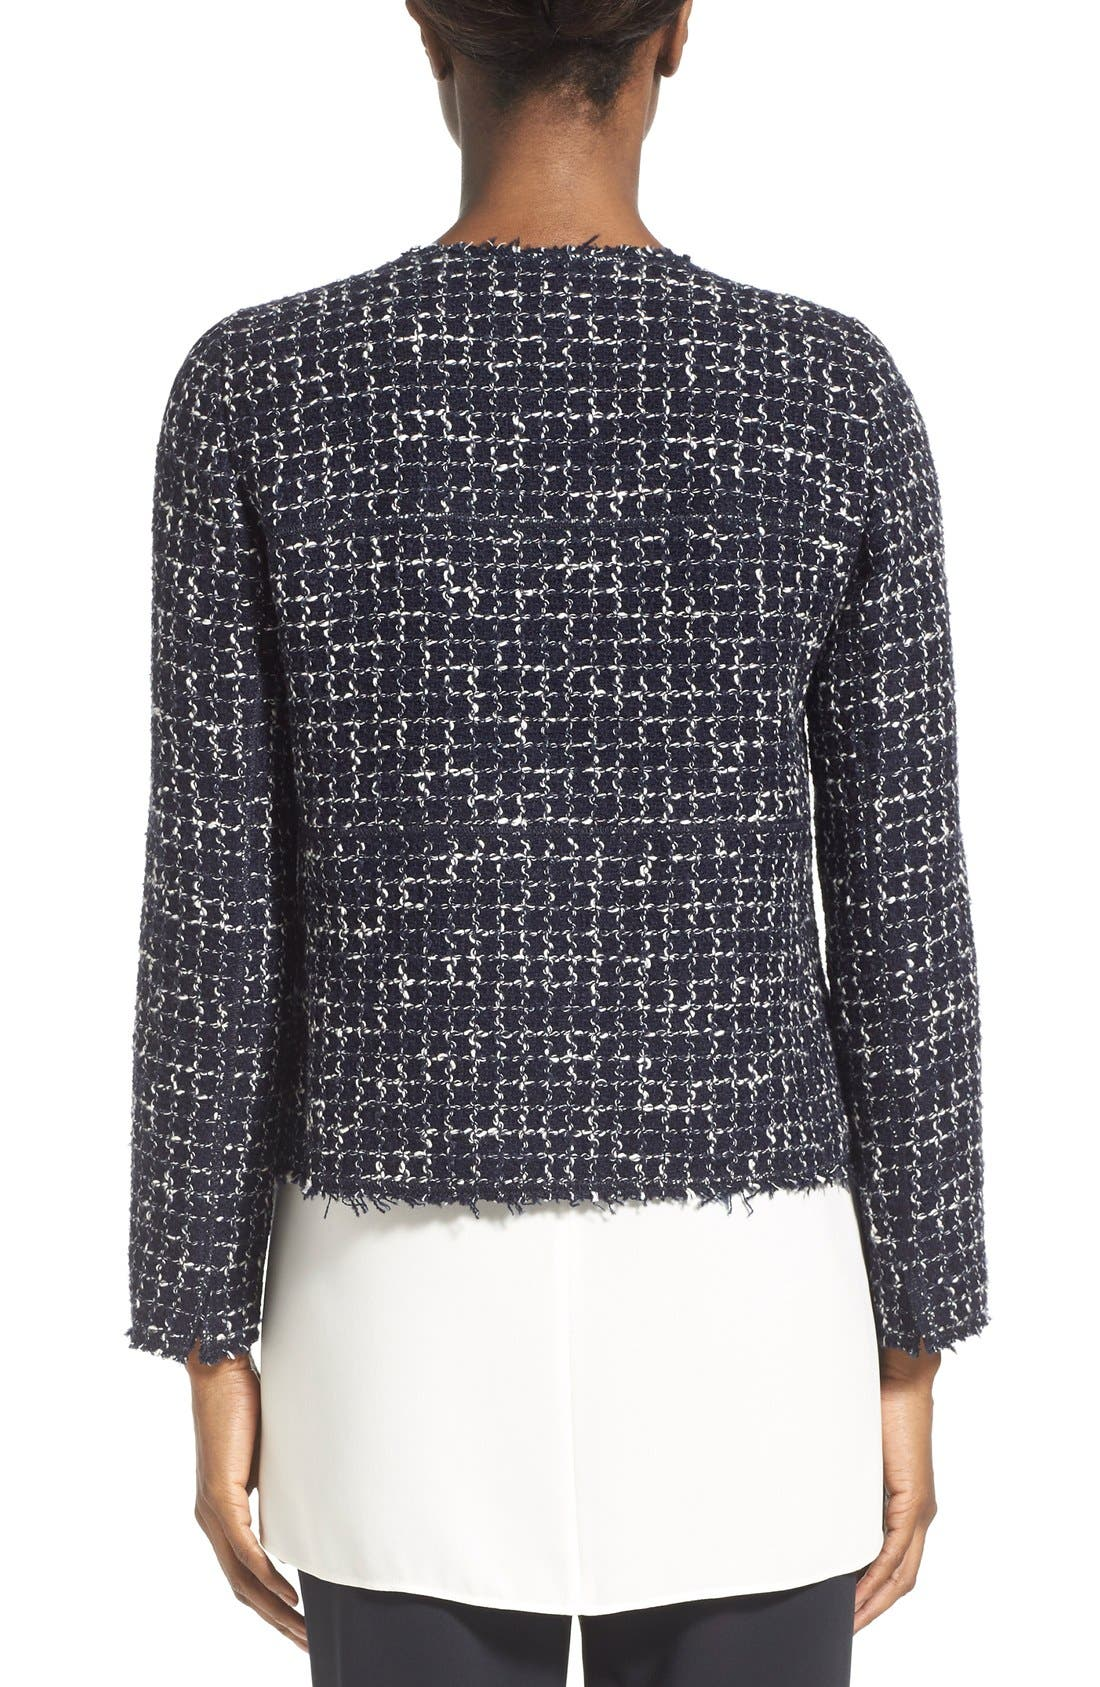 Alternate Image 3  - Lafayette 148 New York 'Dani - Tempered Tweed' Jacket (Regular & Petite)